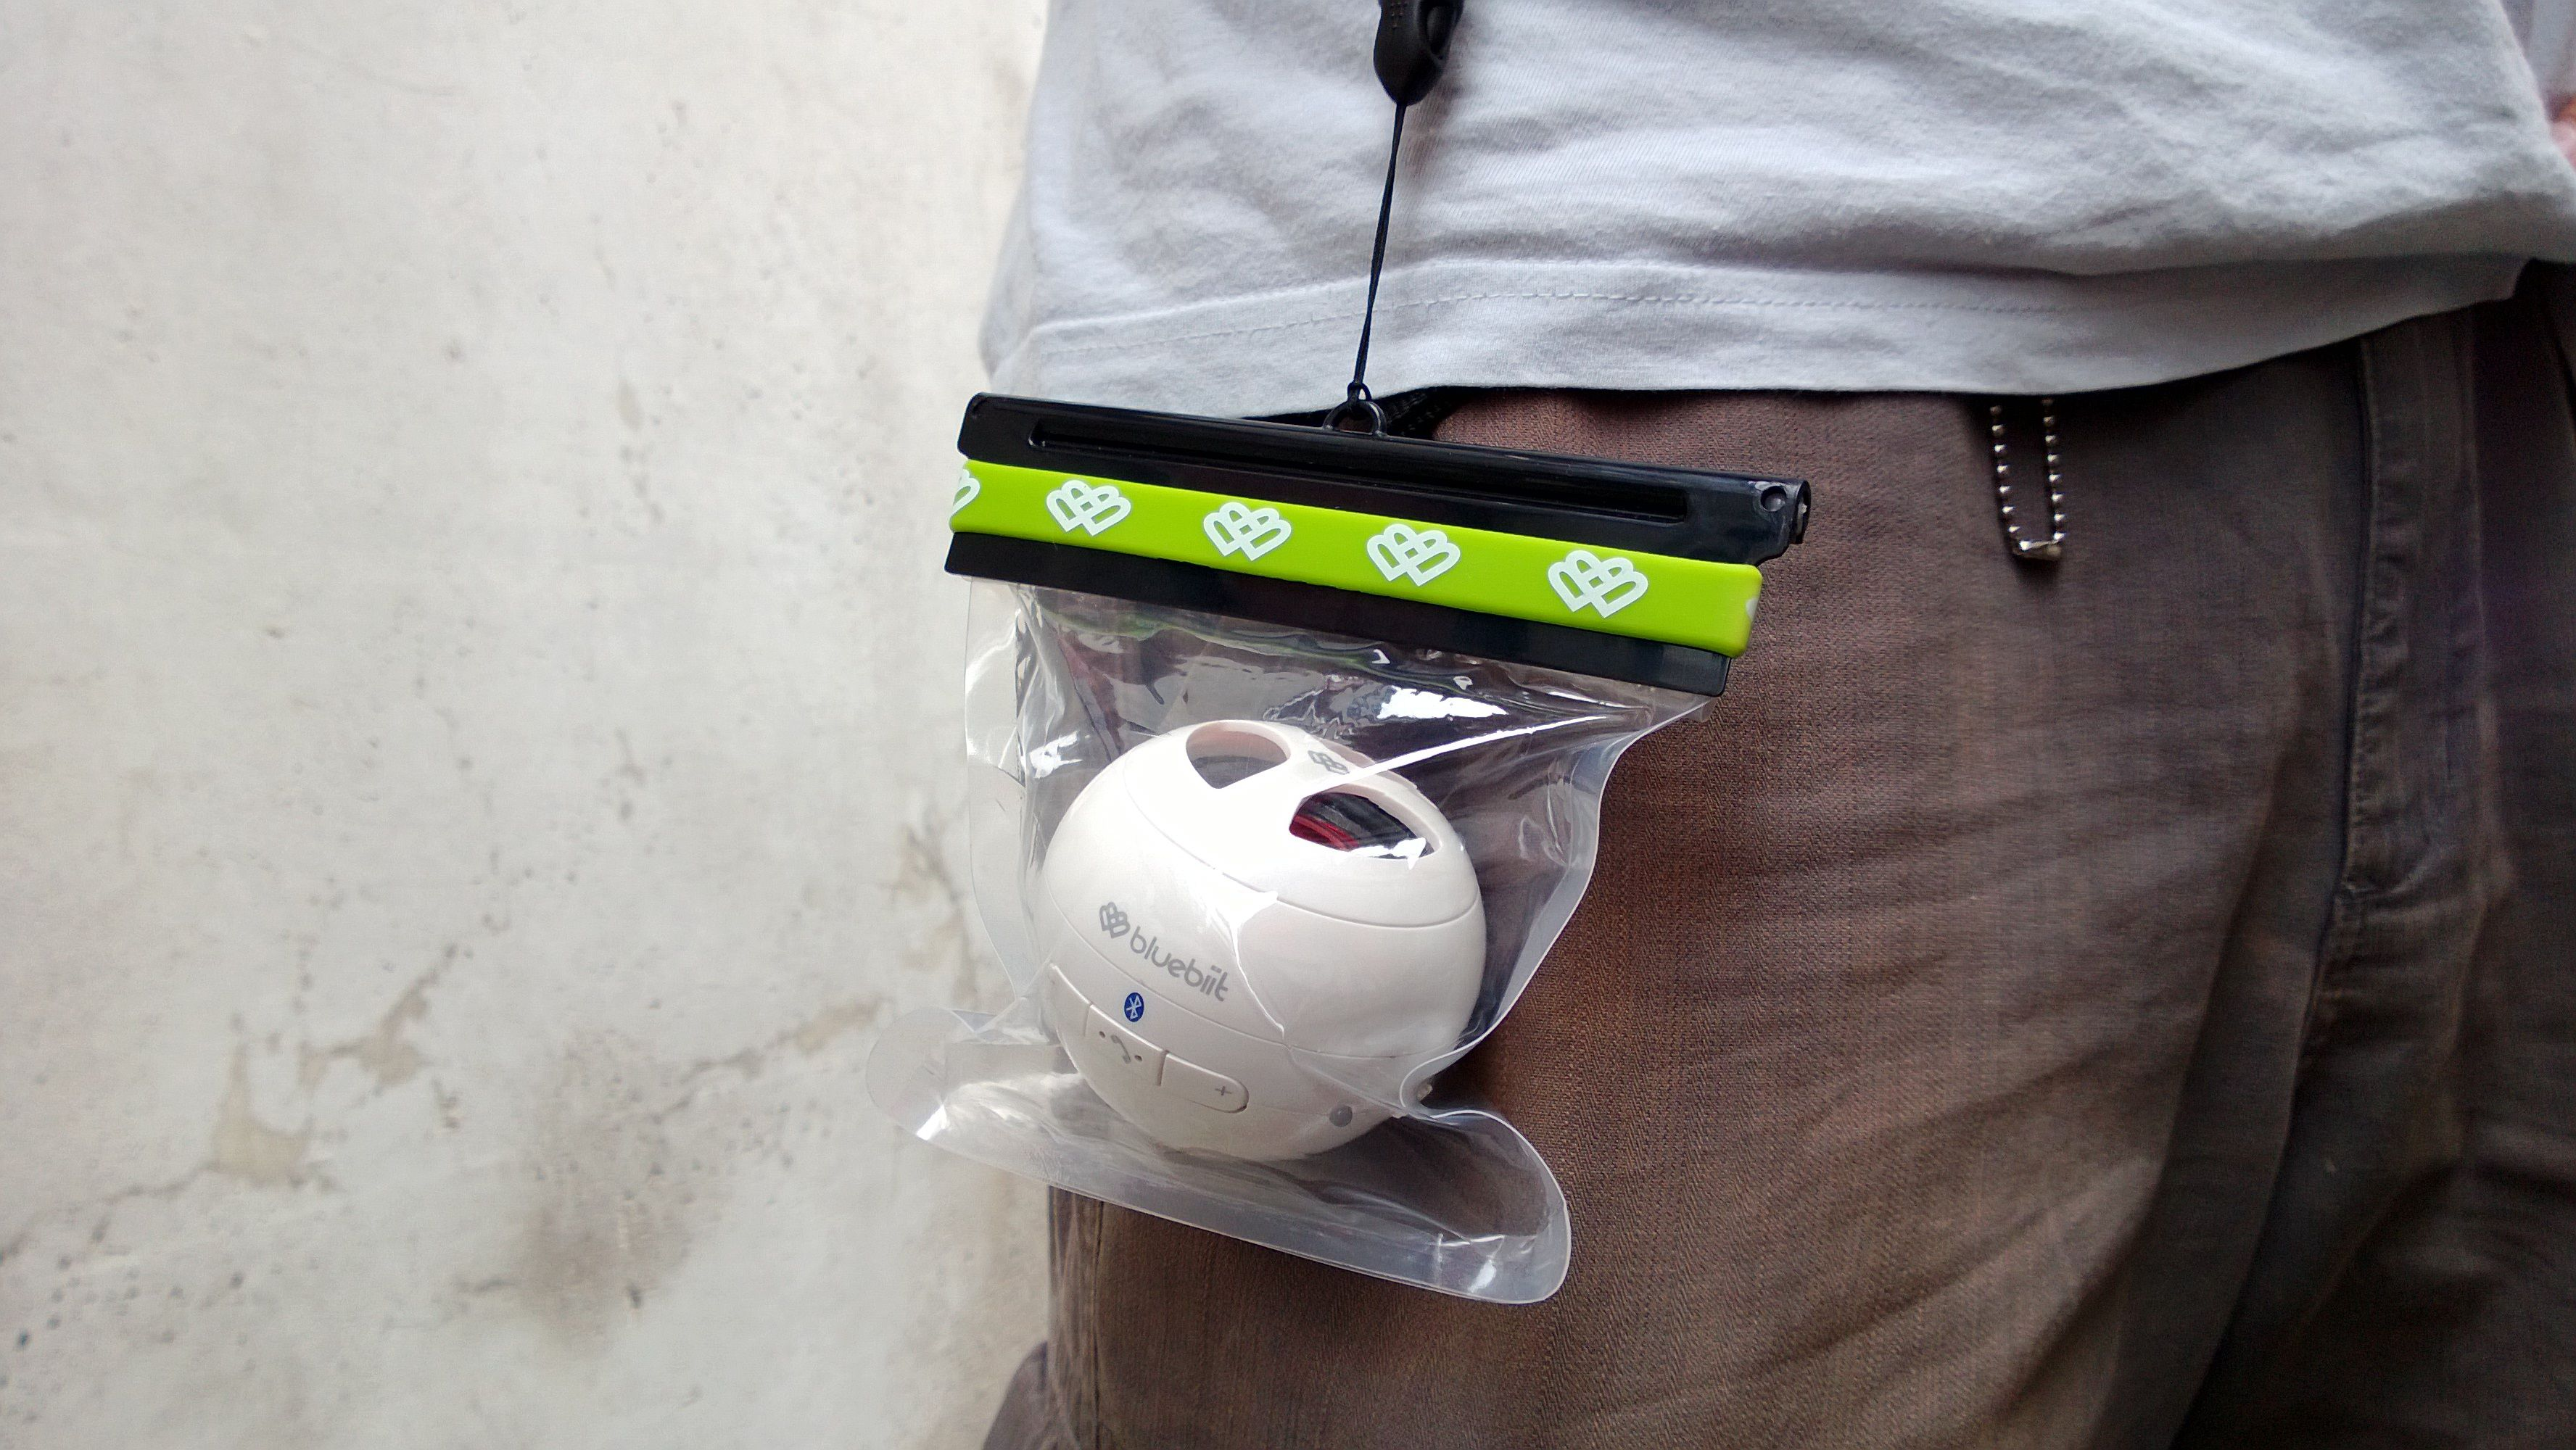 Vesitiivis suojapussi Soundballille